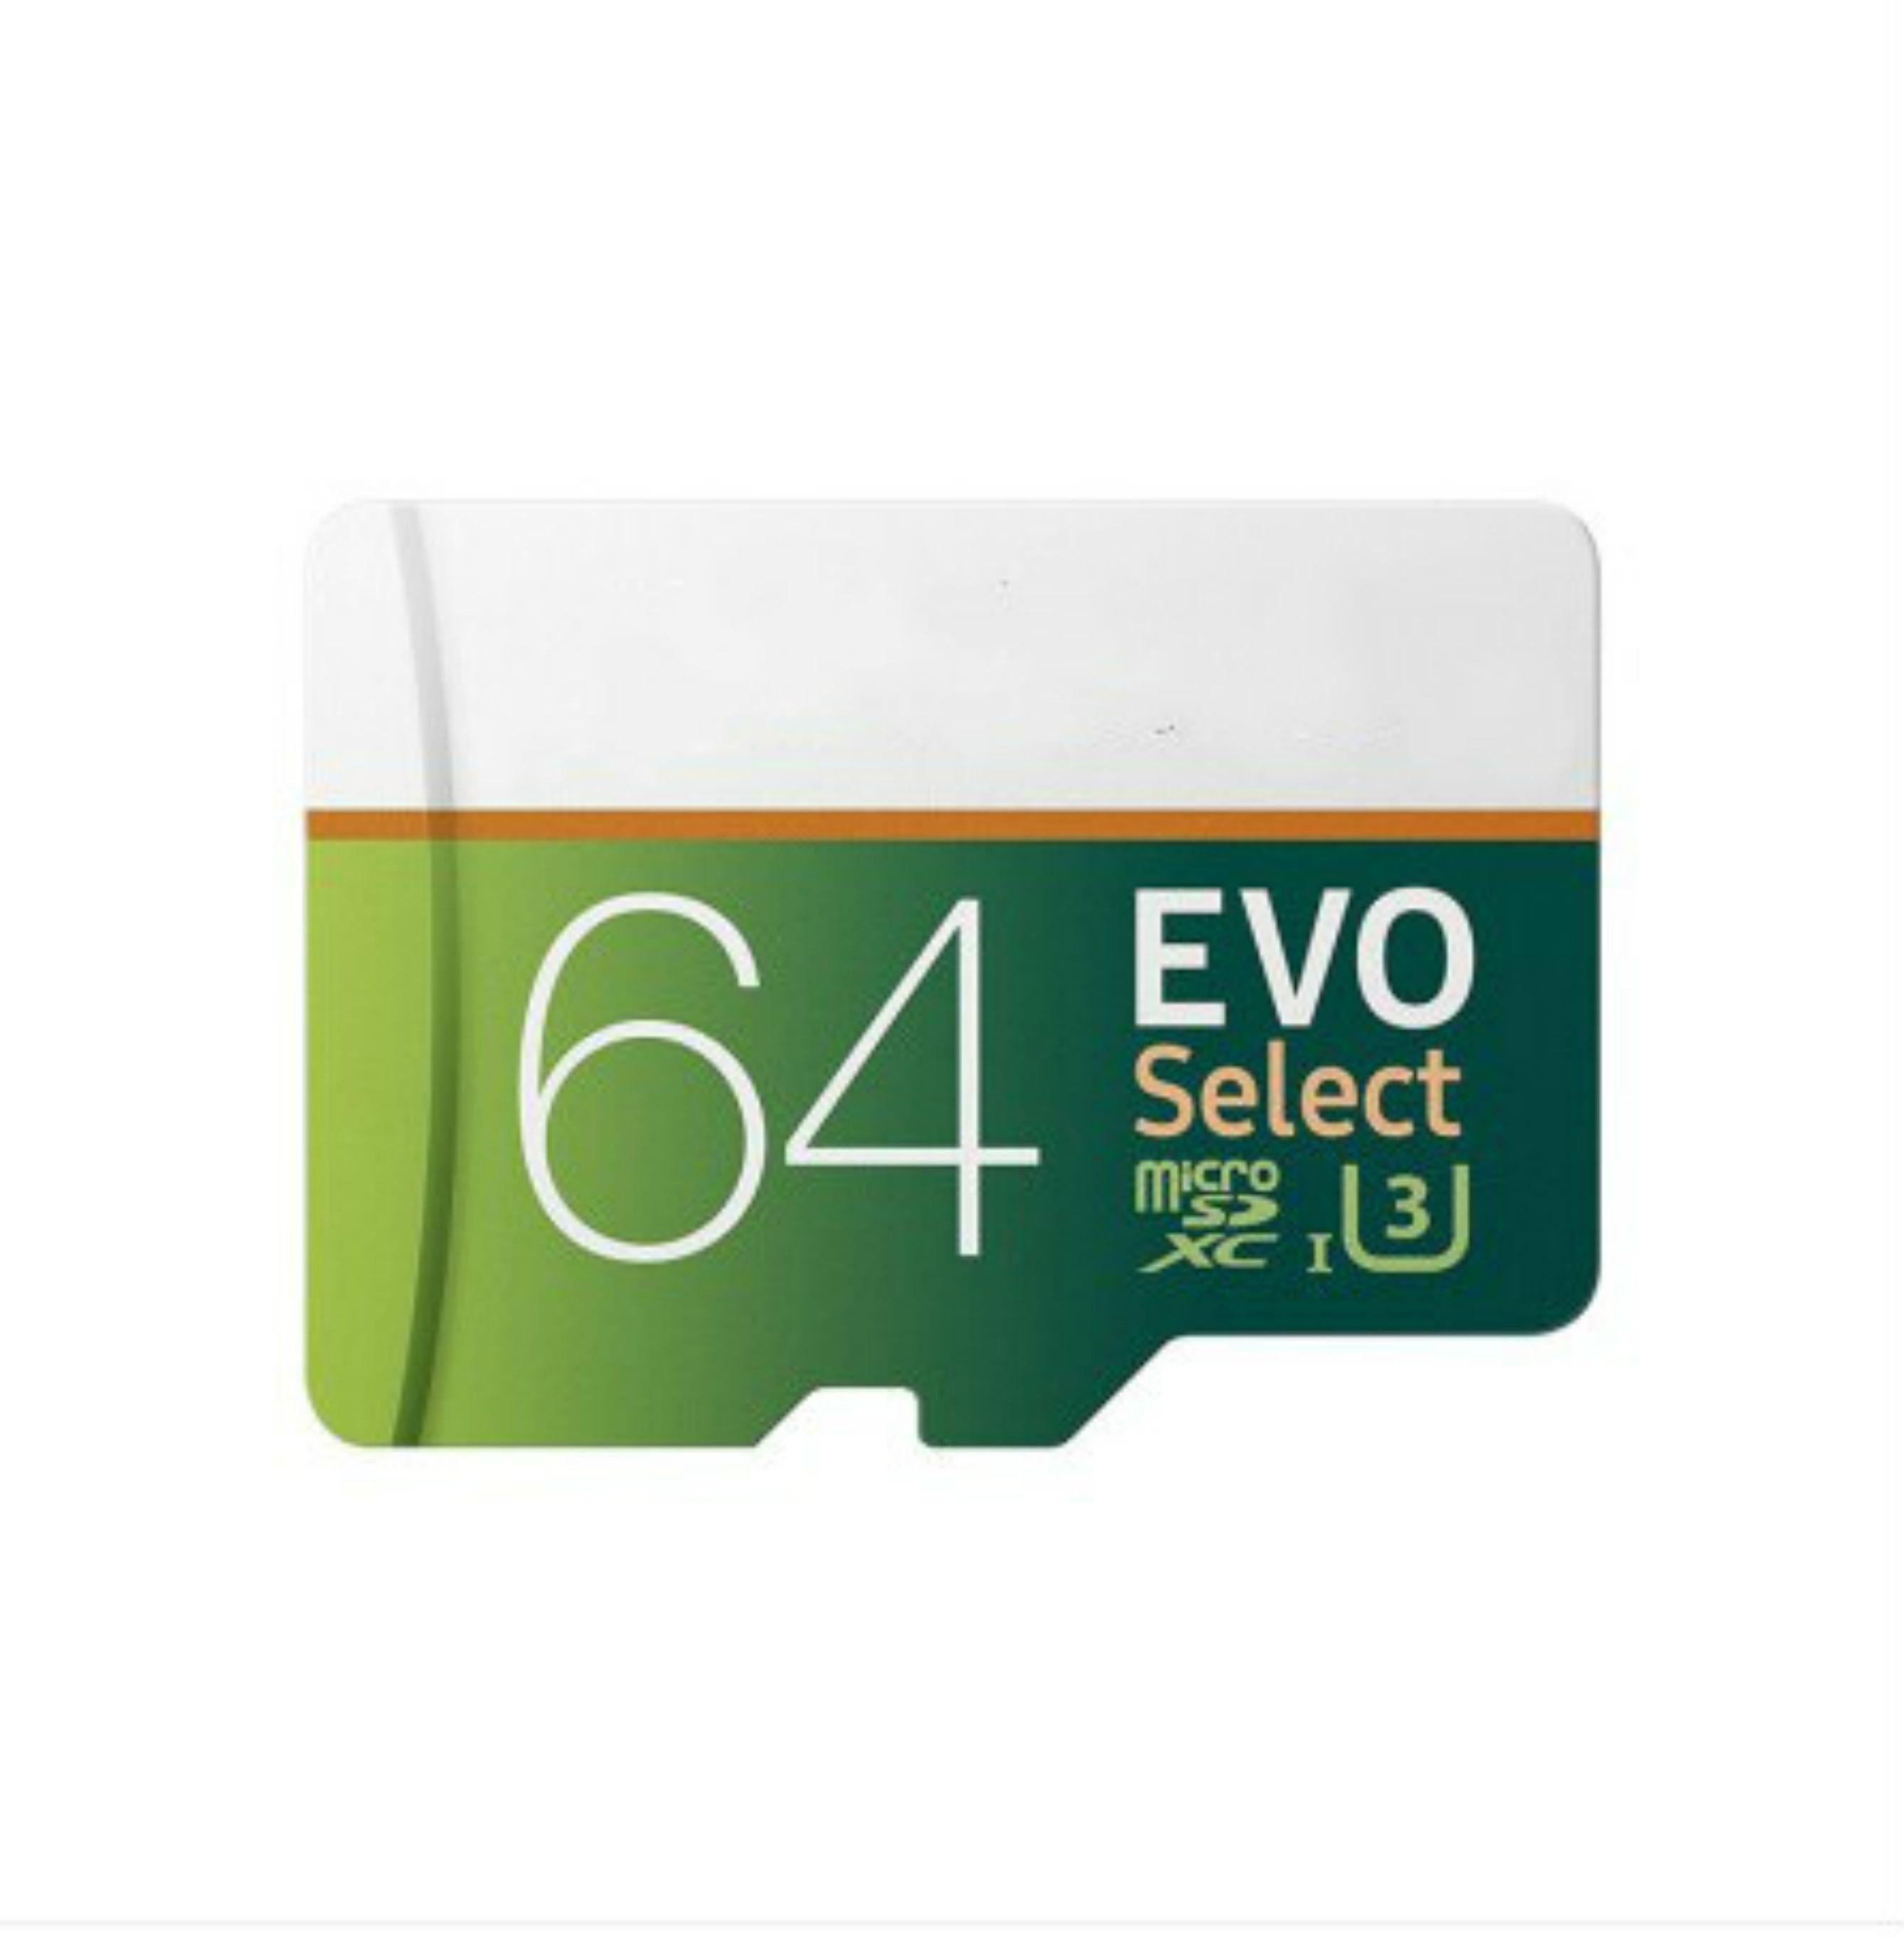 32GB / 64GB / 128GB / 256GB Samsung EVO Выбрать карту Micro SD / смартфон SDXC карта для хранения / TF-карта / карта памяти камеры 100 МБ / с